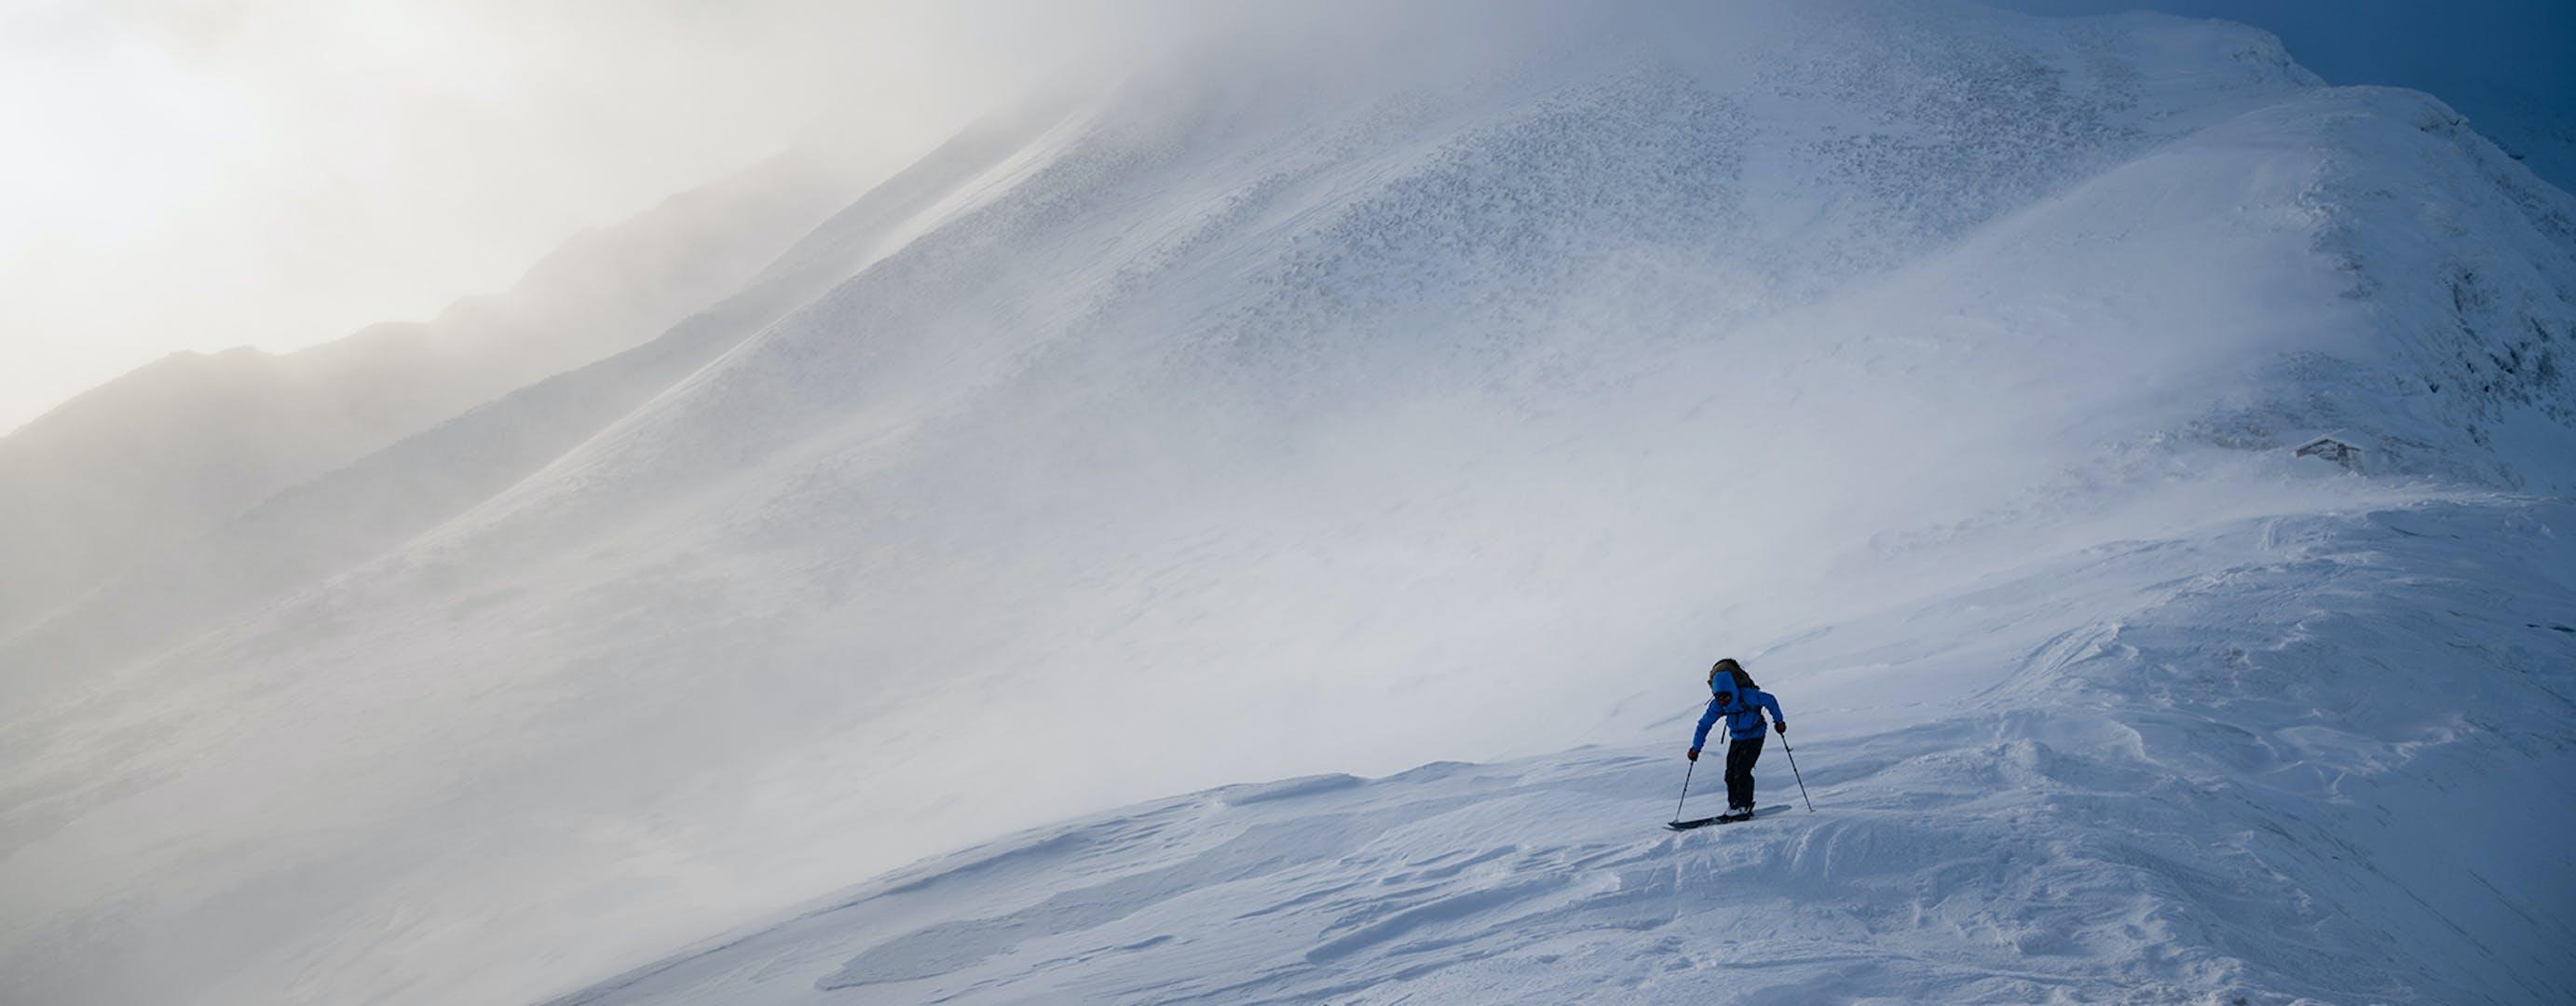 Parkin Ski Touring.